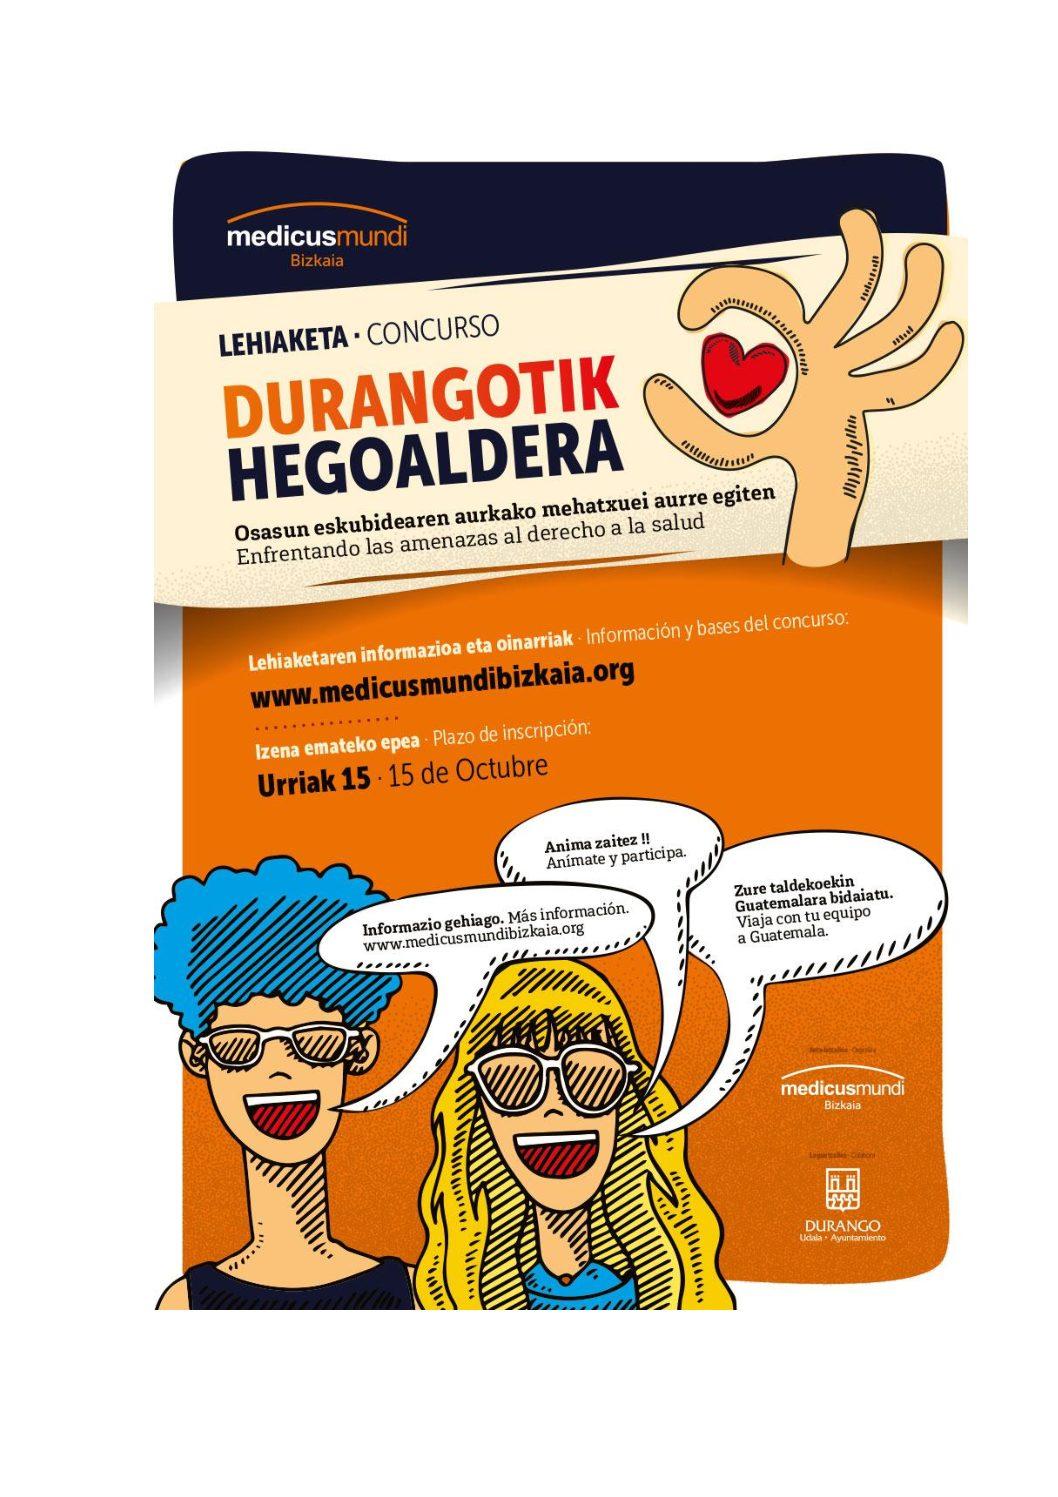 DURANGOTIK HEGOALDERA –  Concurso Image